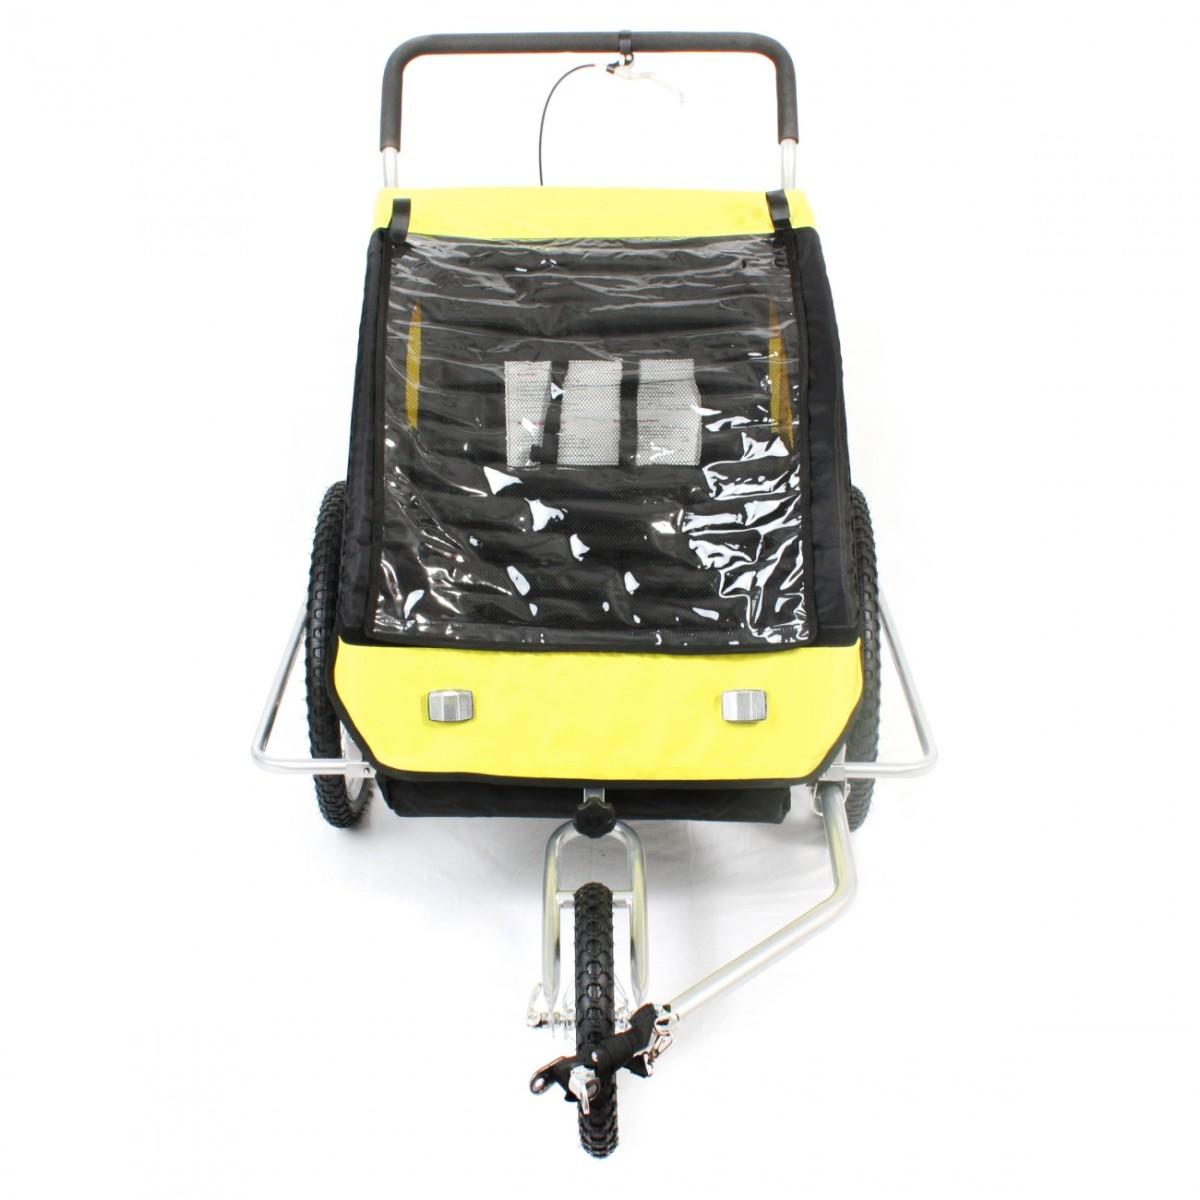 Remorque Vélo convertible Jogger 2en1 Enfants Amortisseur Transport